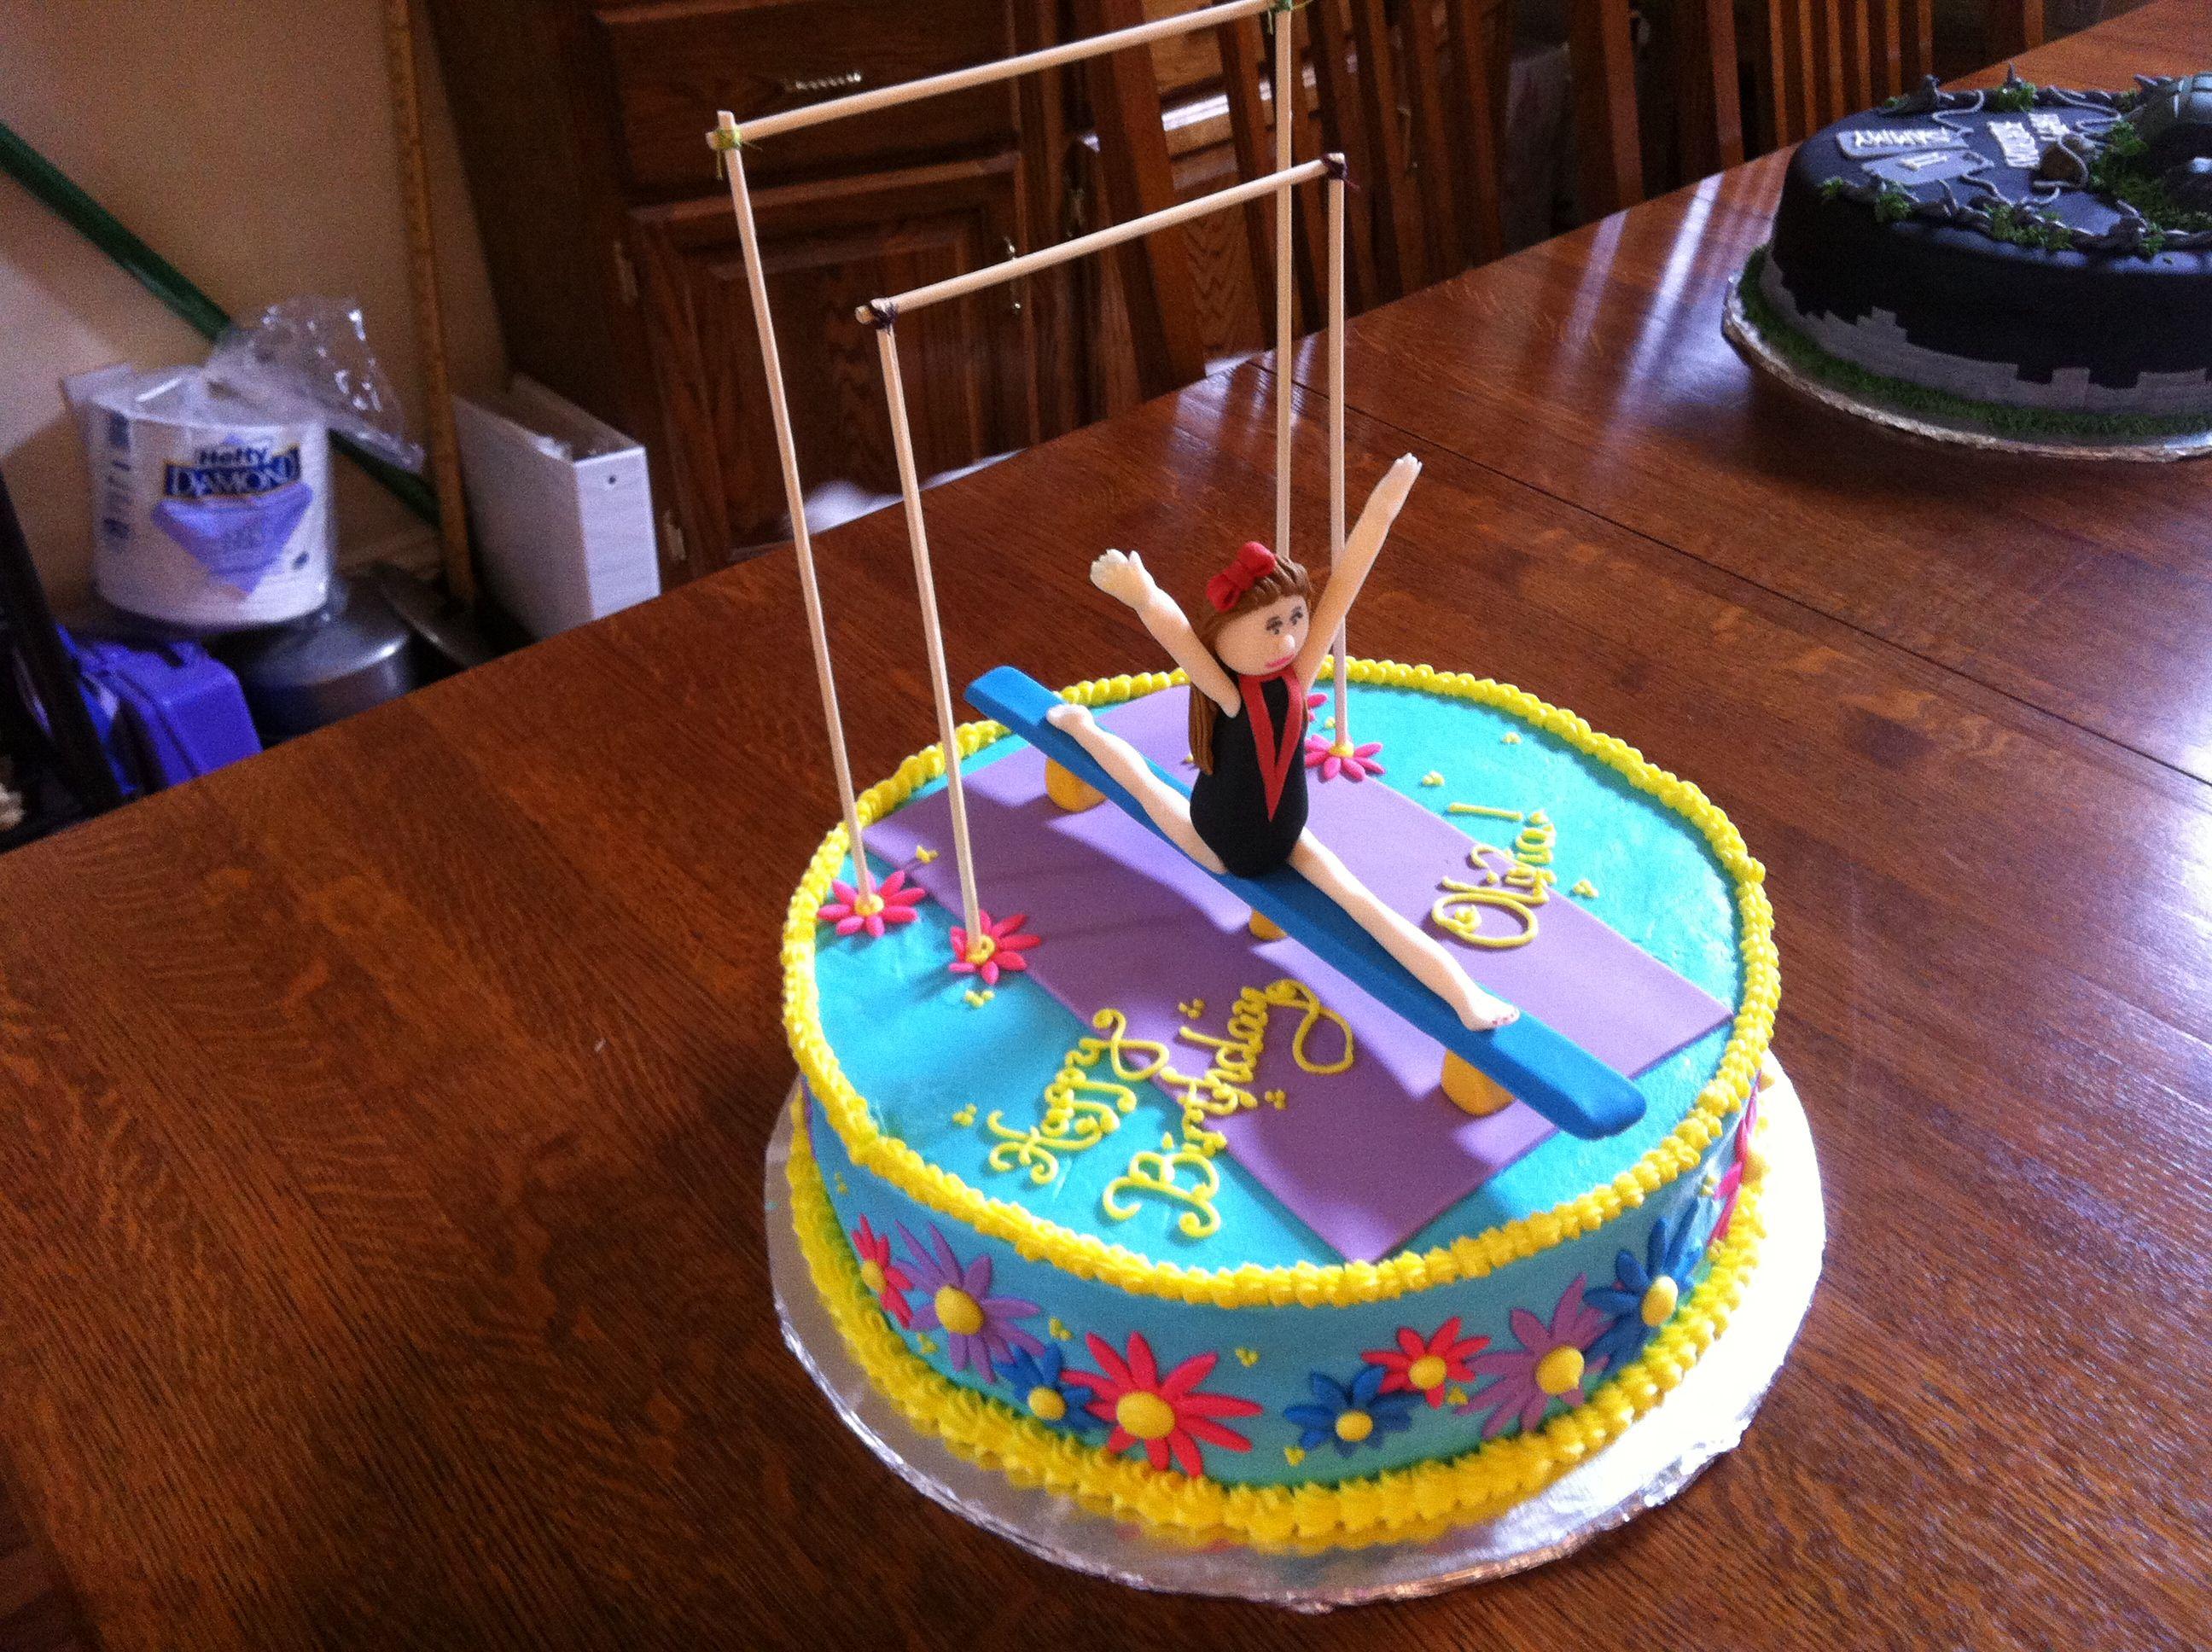 Tremendous Gymnastics Cake Gymnastics Cakes Gymnastics Birthday Cakes 3Rd Personalised Birthday Cards Cominlily Jamesorg